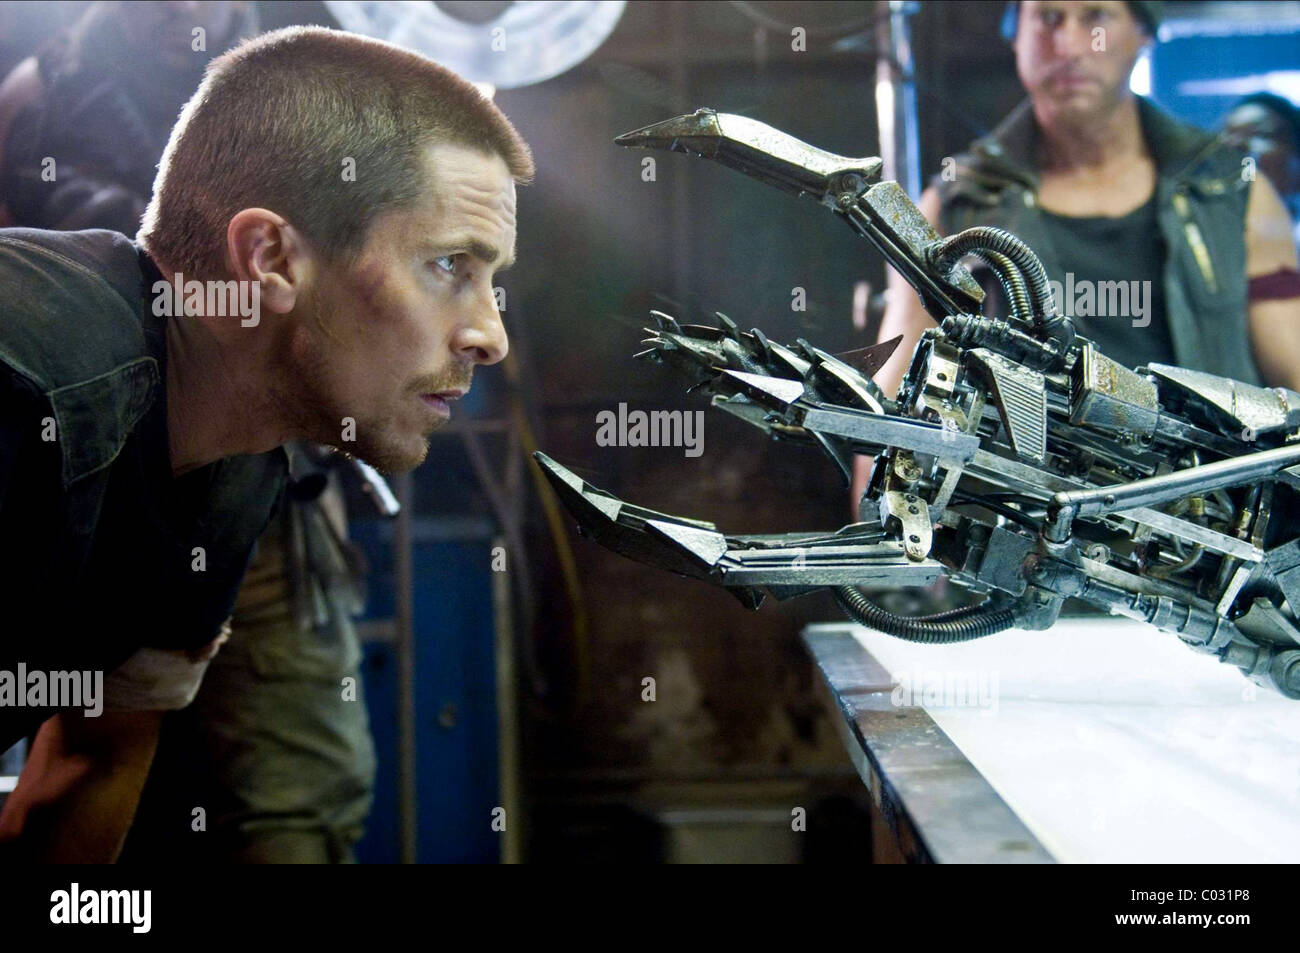 Christian Bale Terminator Salvation 2009 Stock Photo Alamy